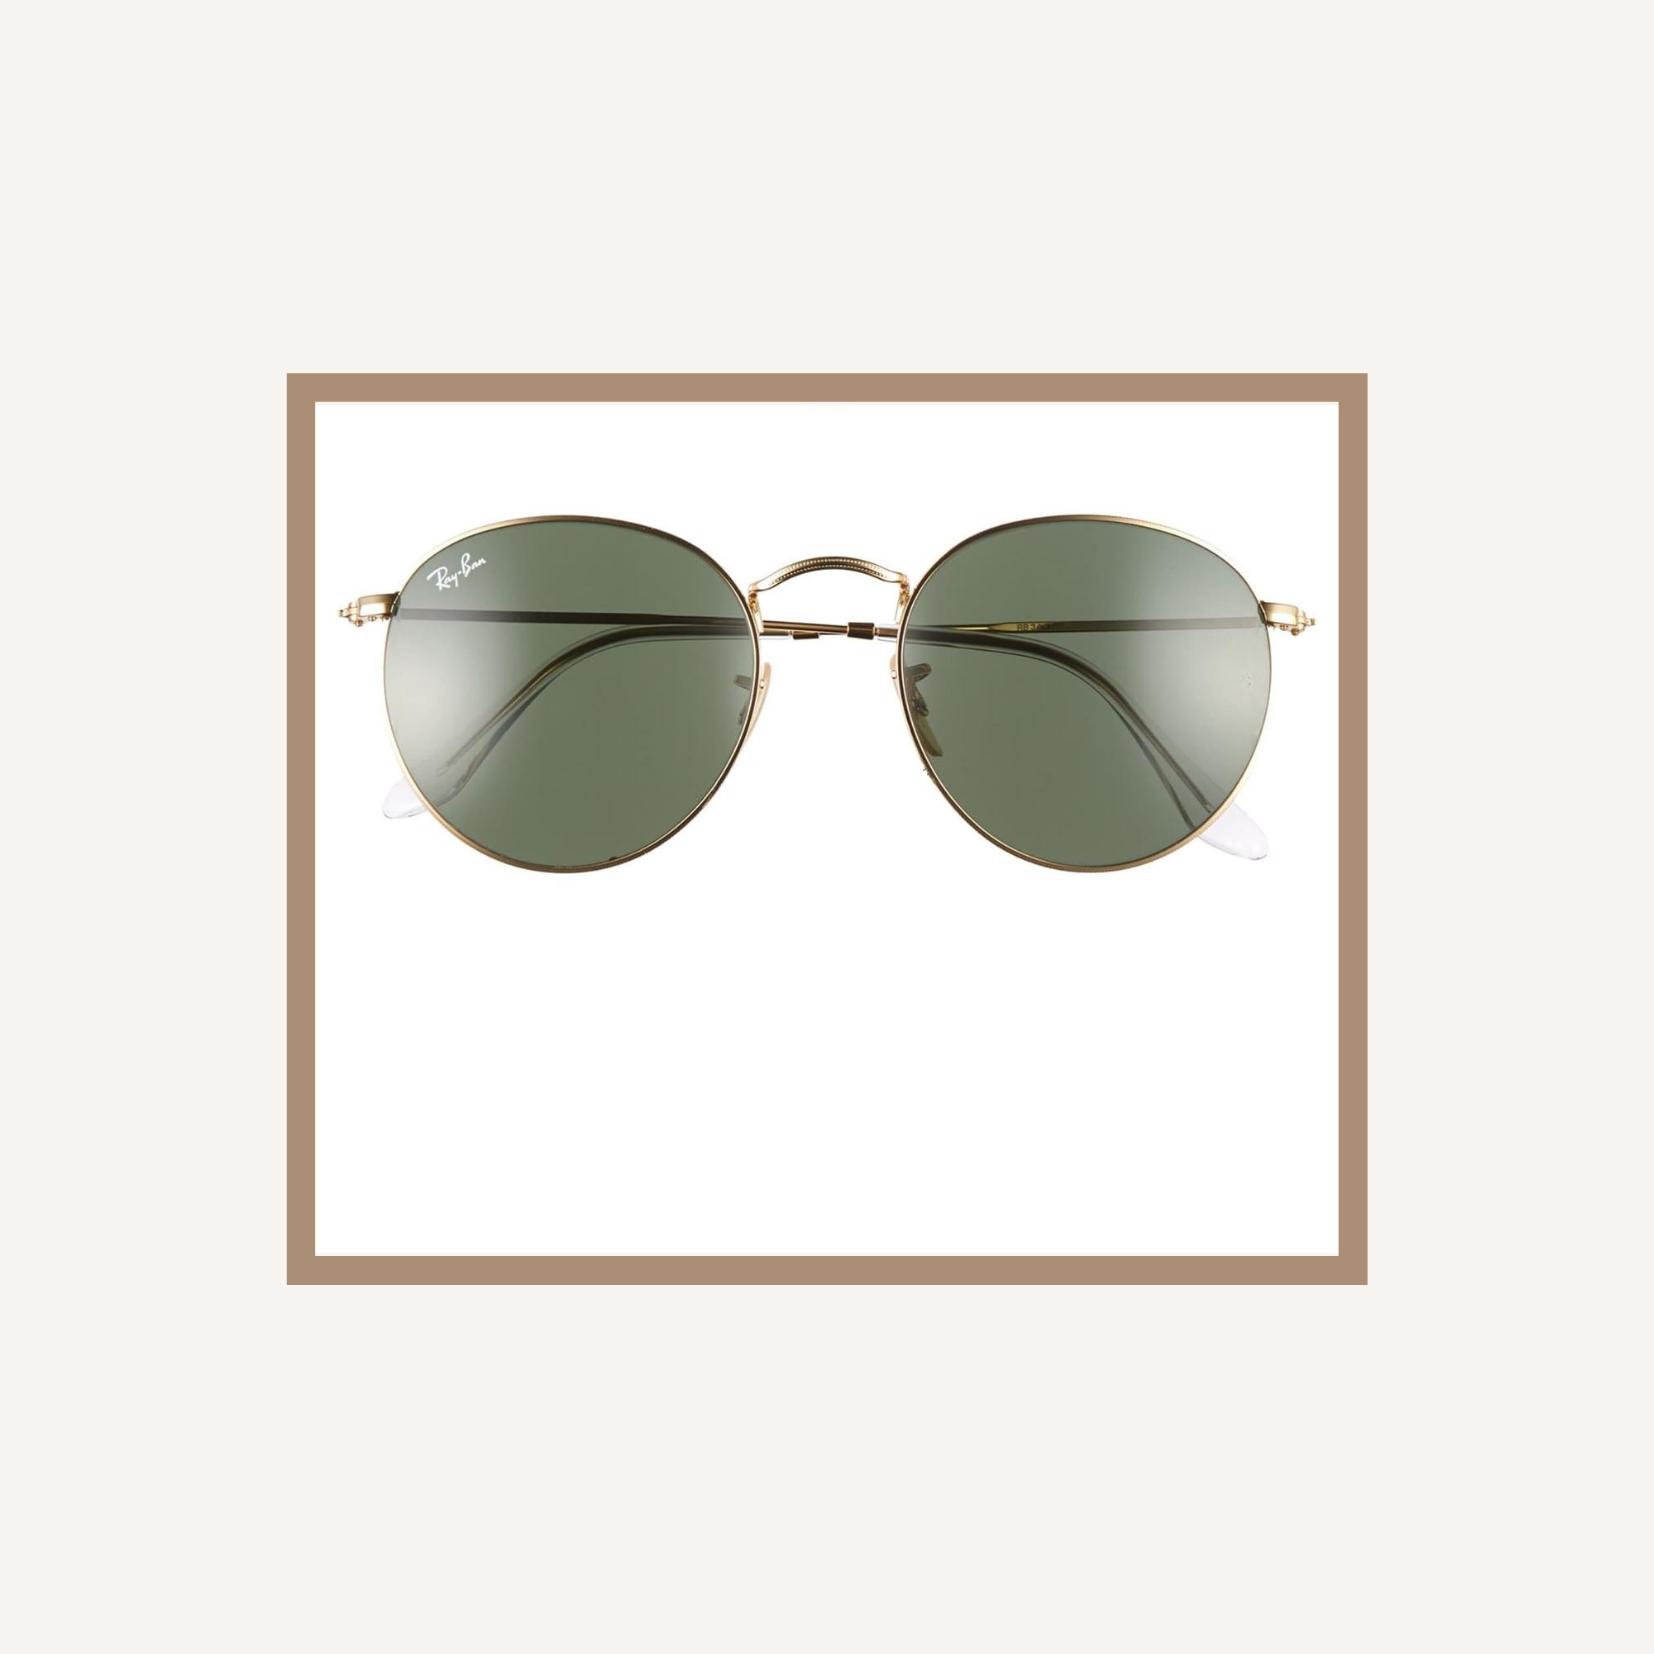 Favorite Sunglasses for All Seasons | Ray Ban Sunglasses | Louella Reese